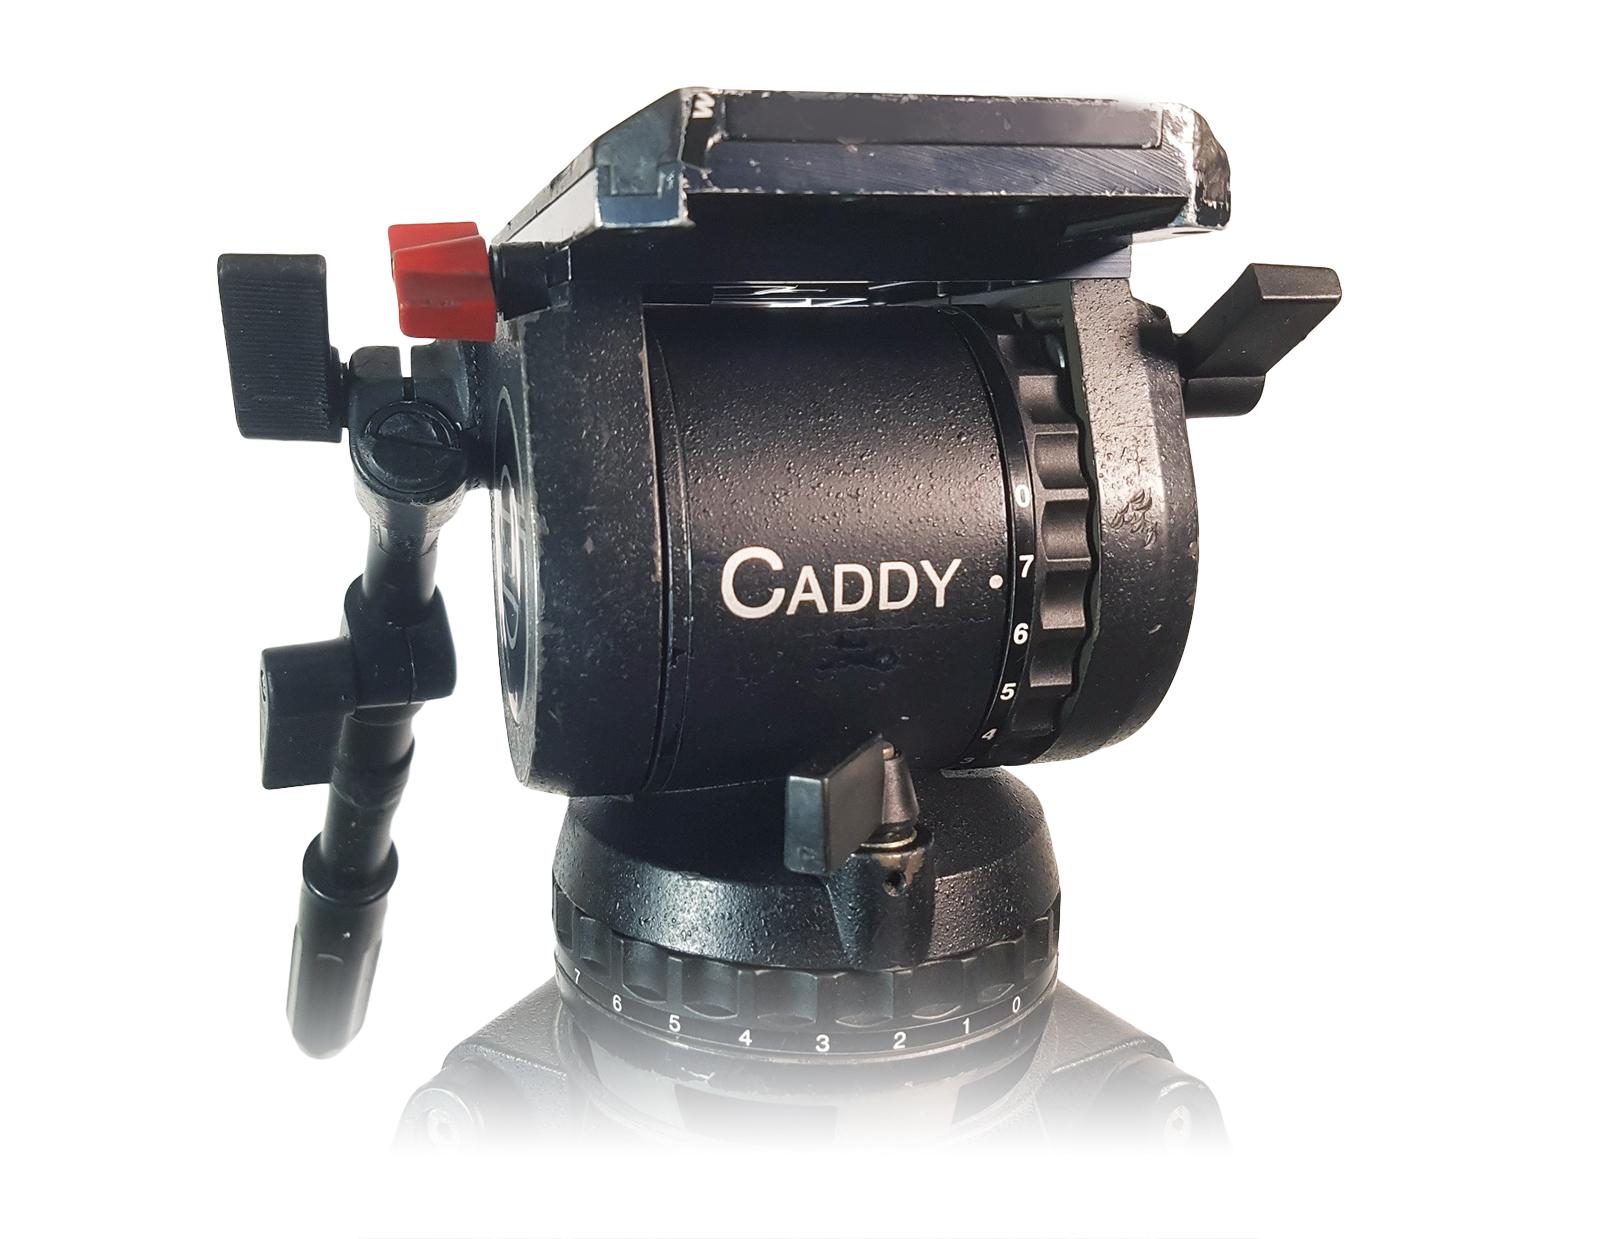 Sachtler Caddy